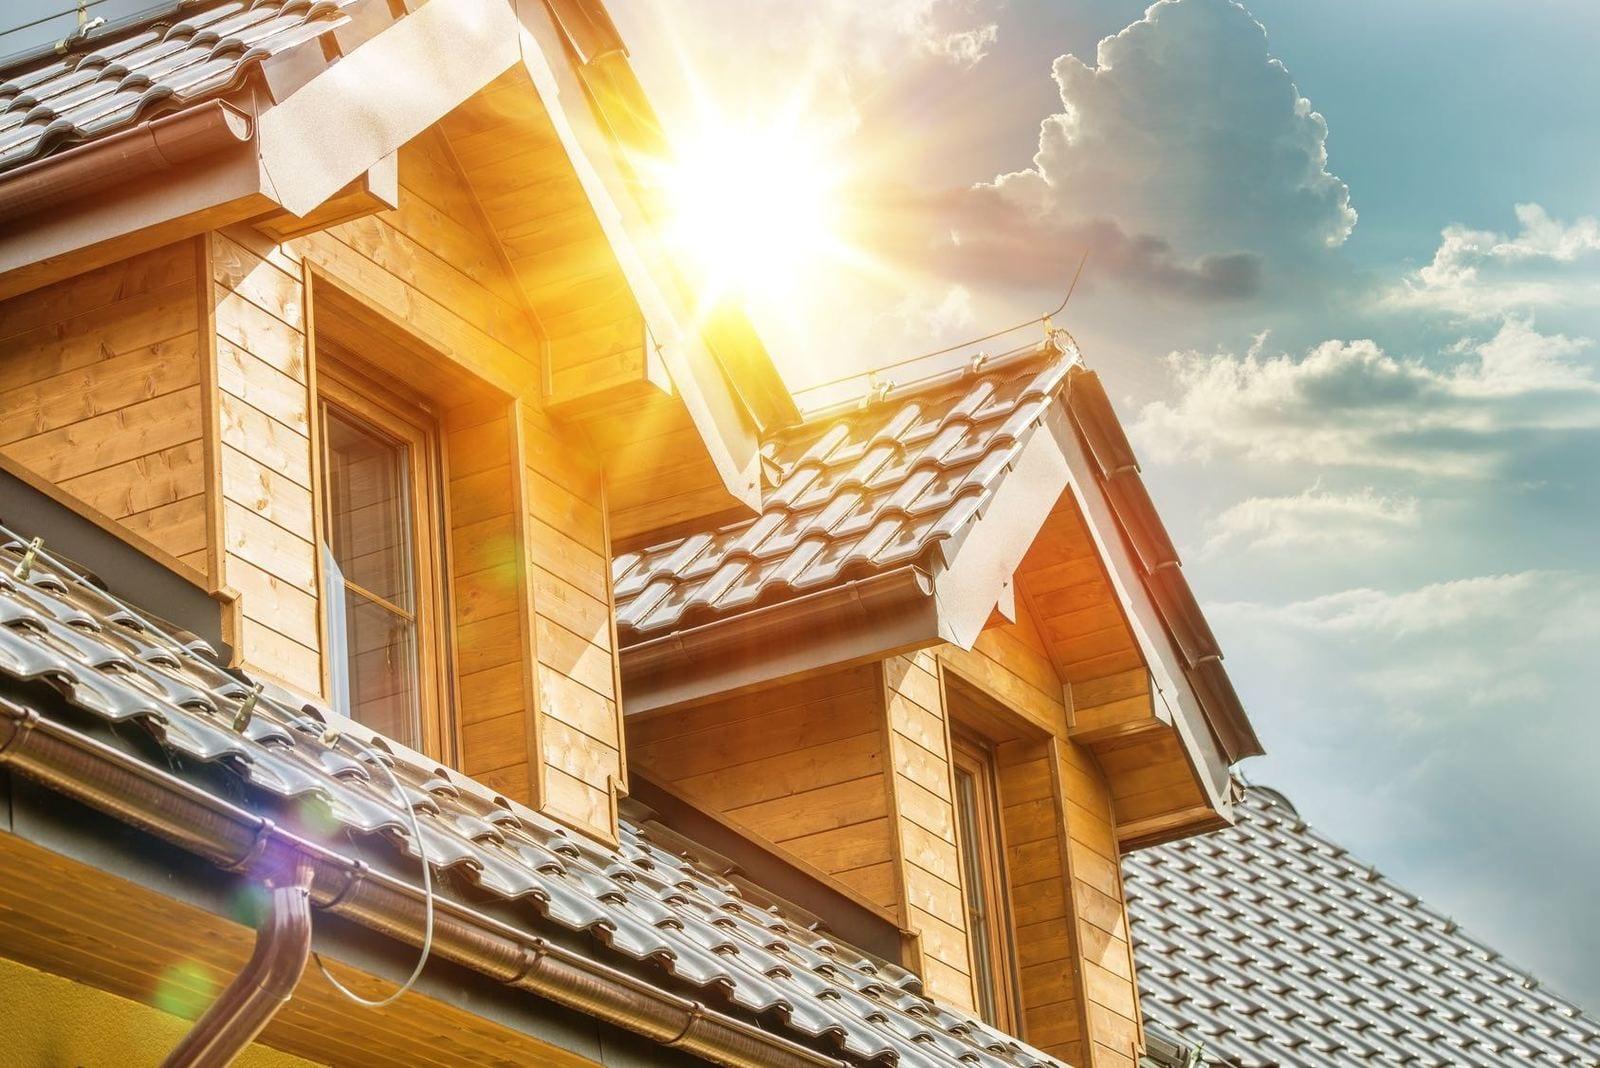 Summer roof tasks